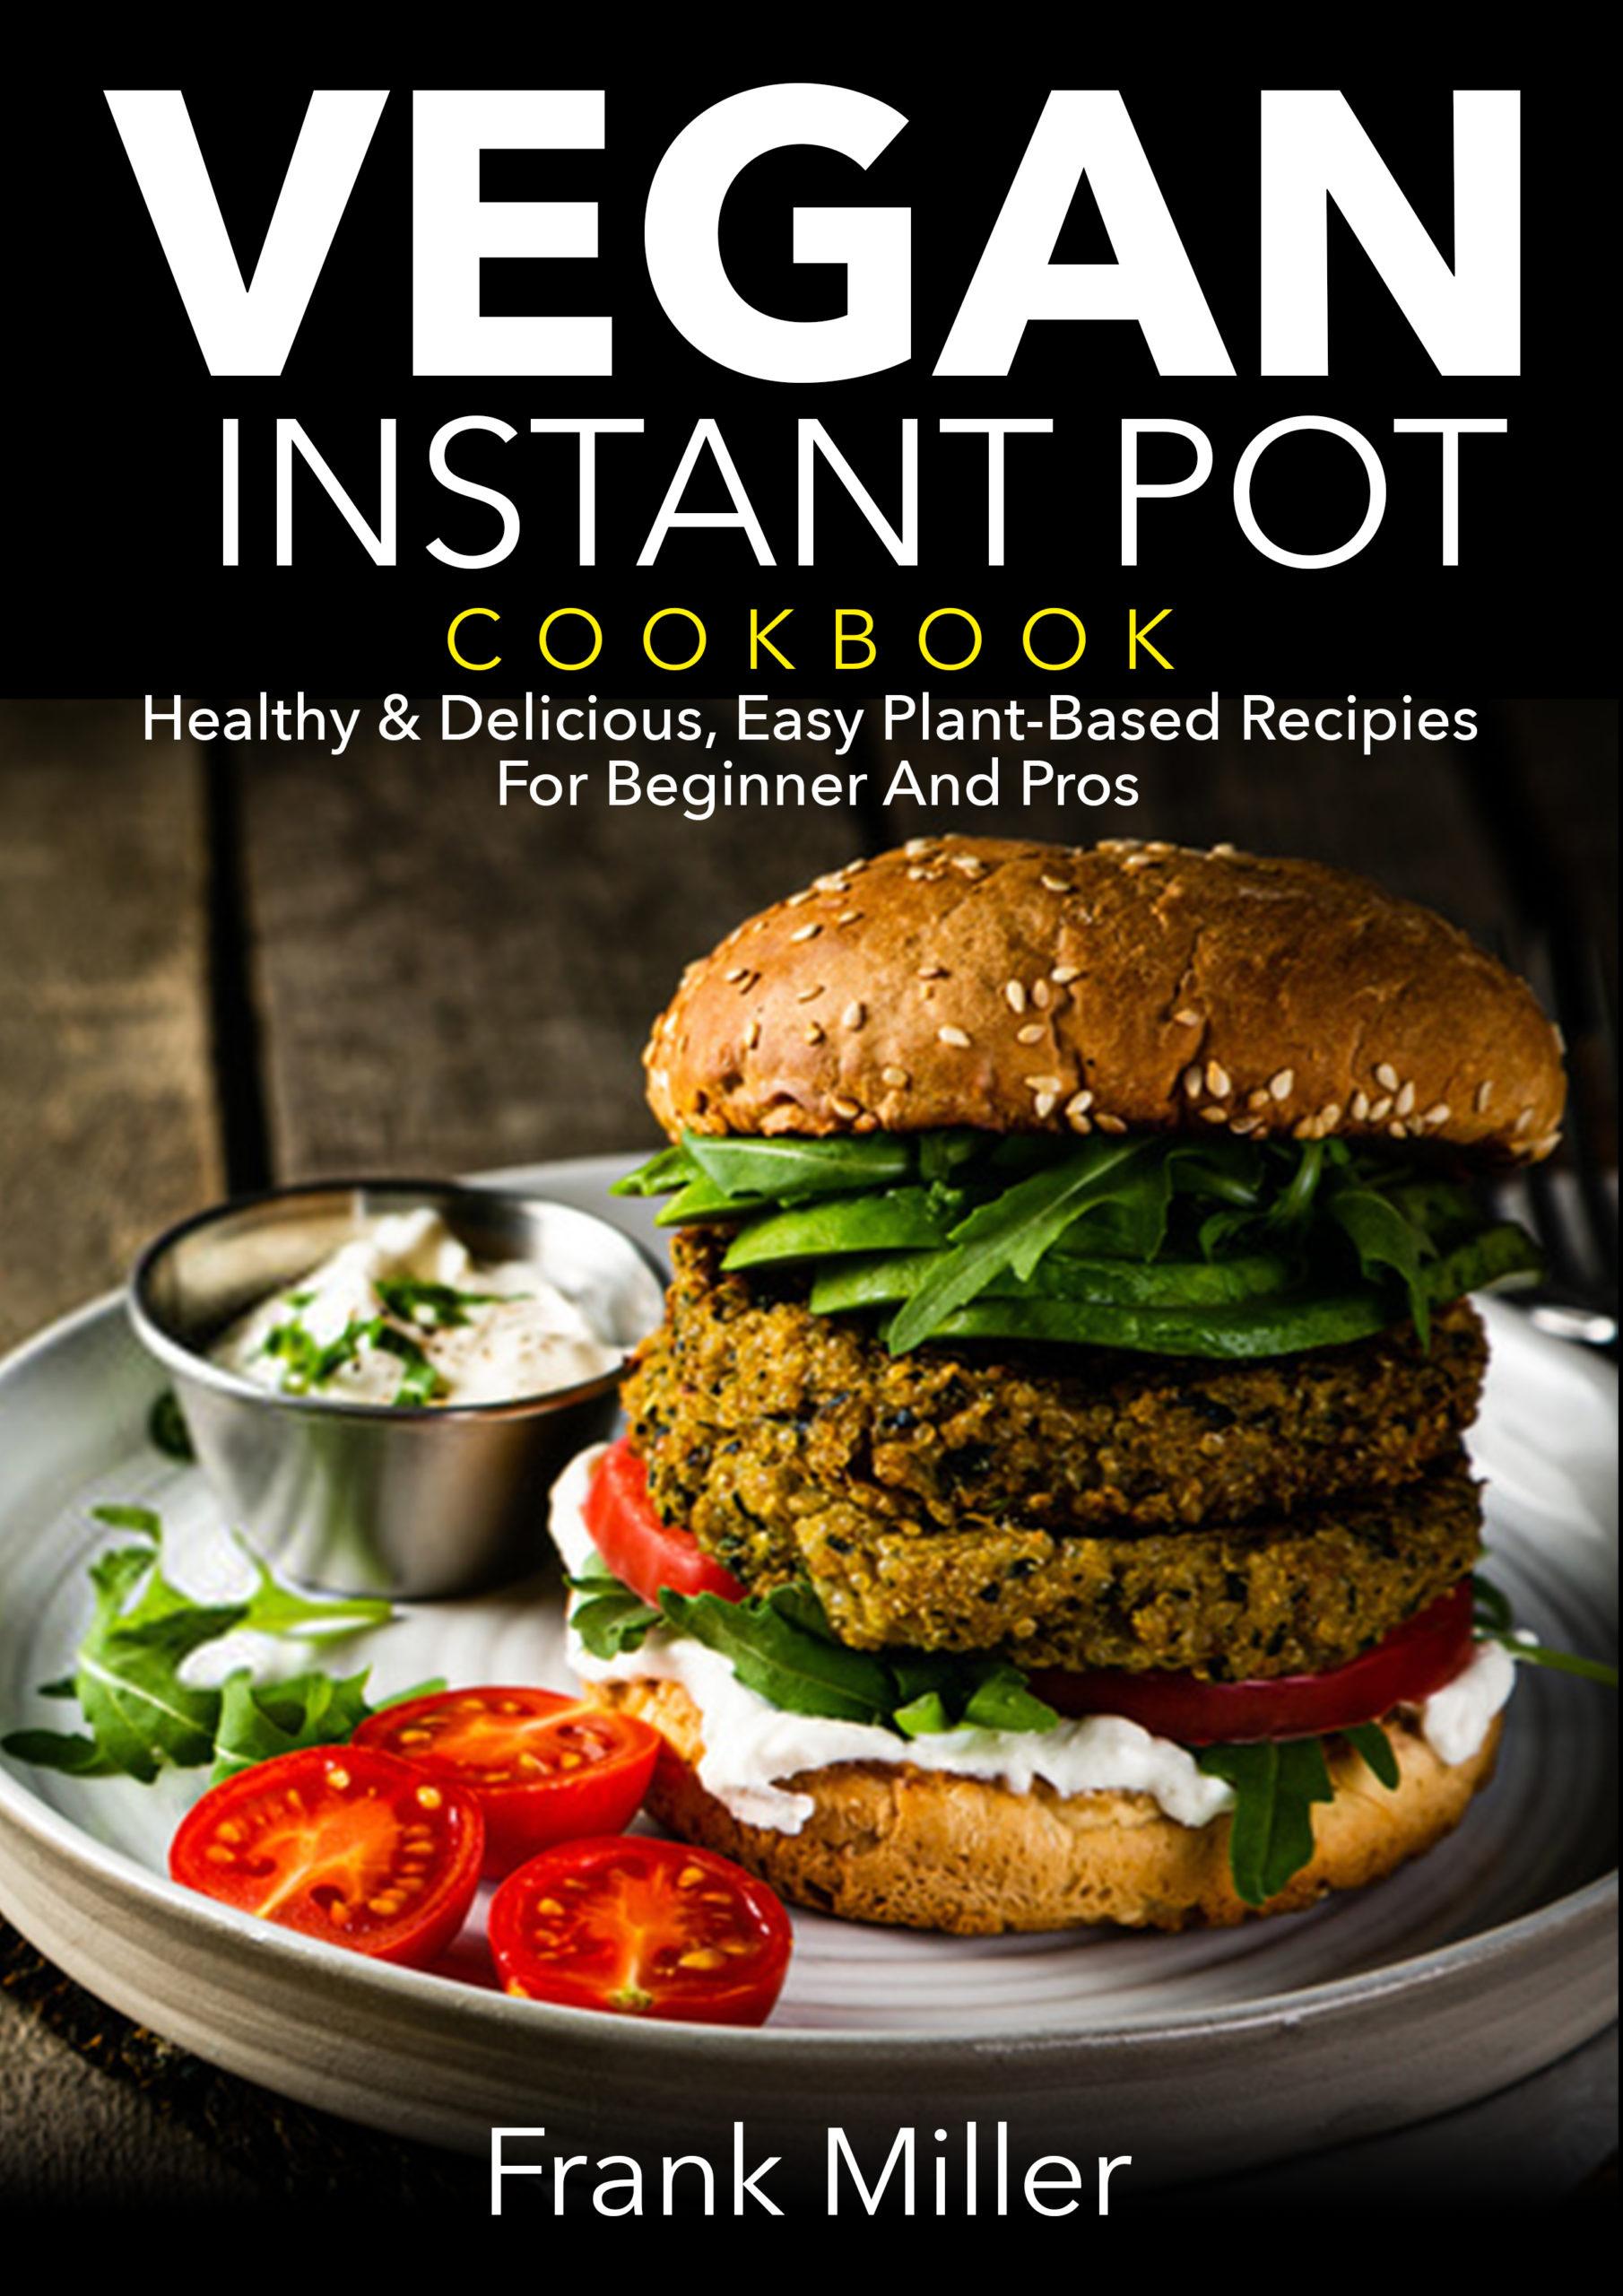 Vegan-Instant-Pot-Cookbook